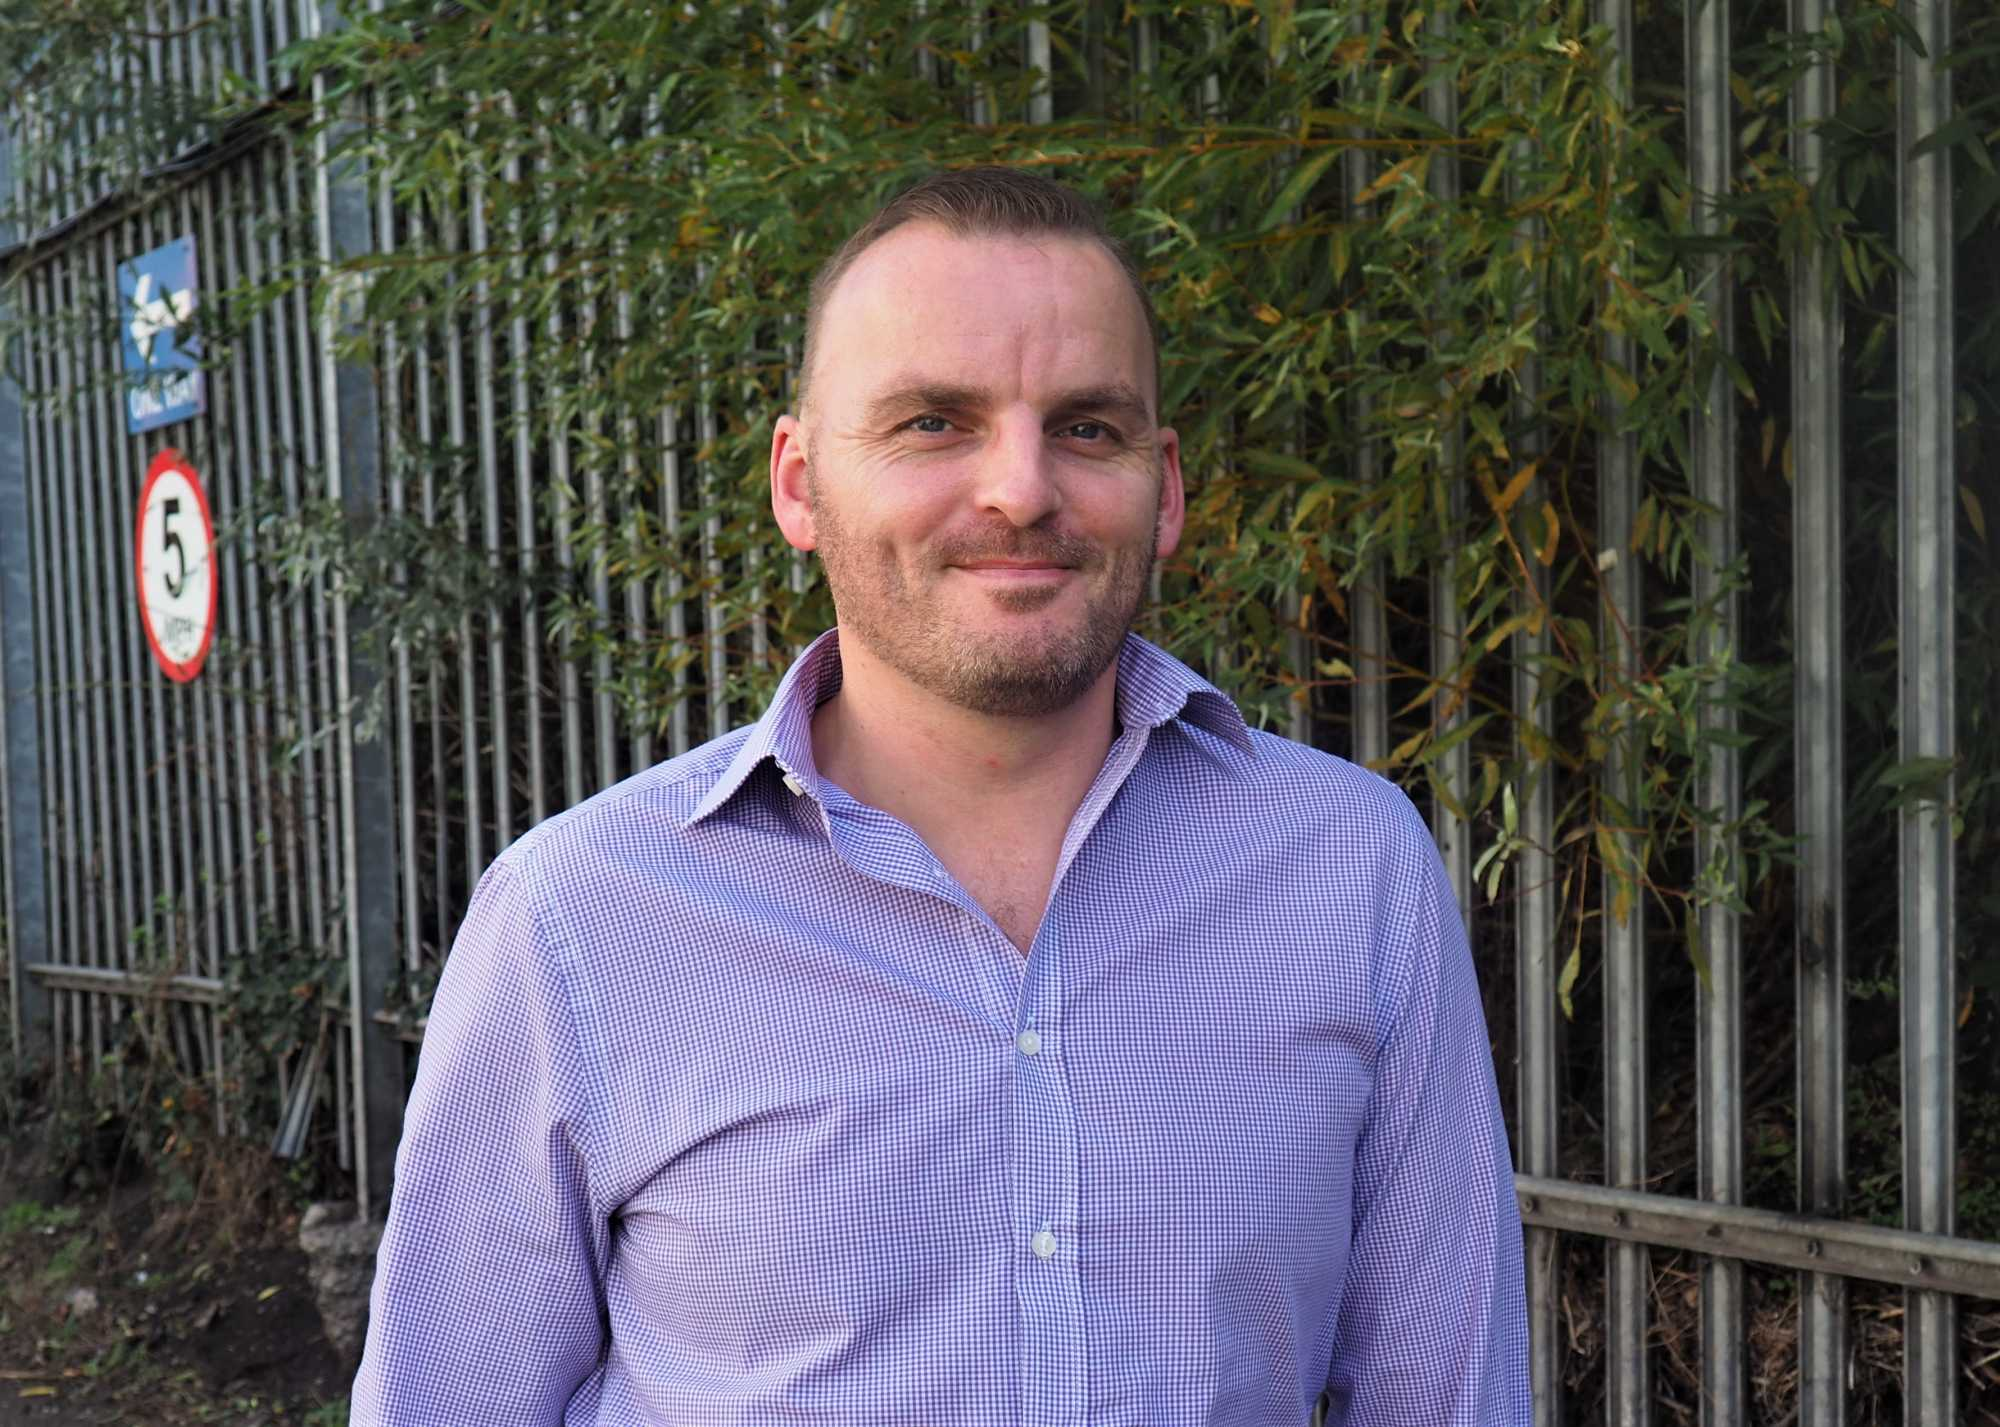 Owen Gordon